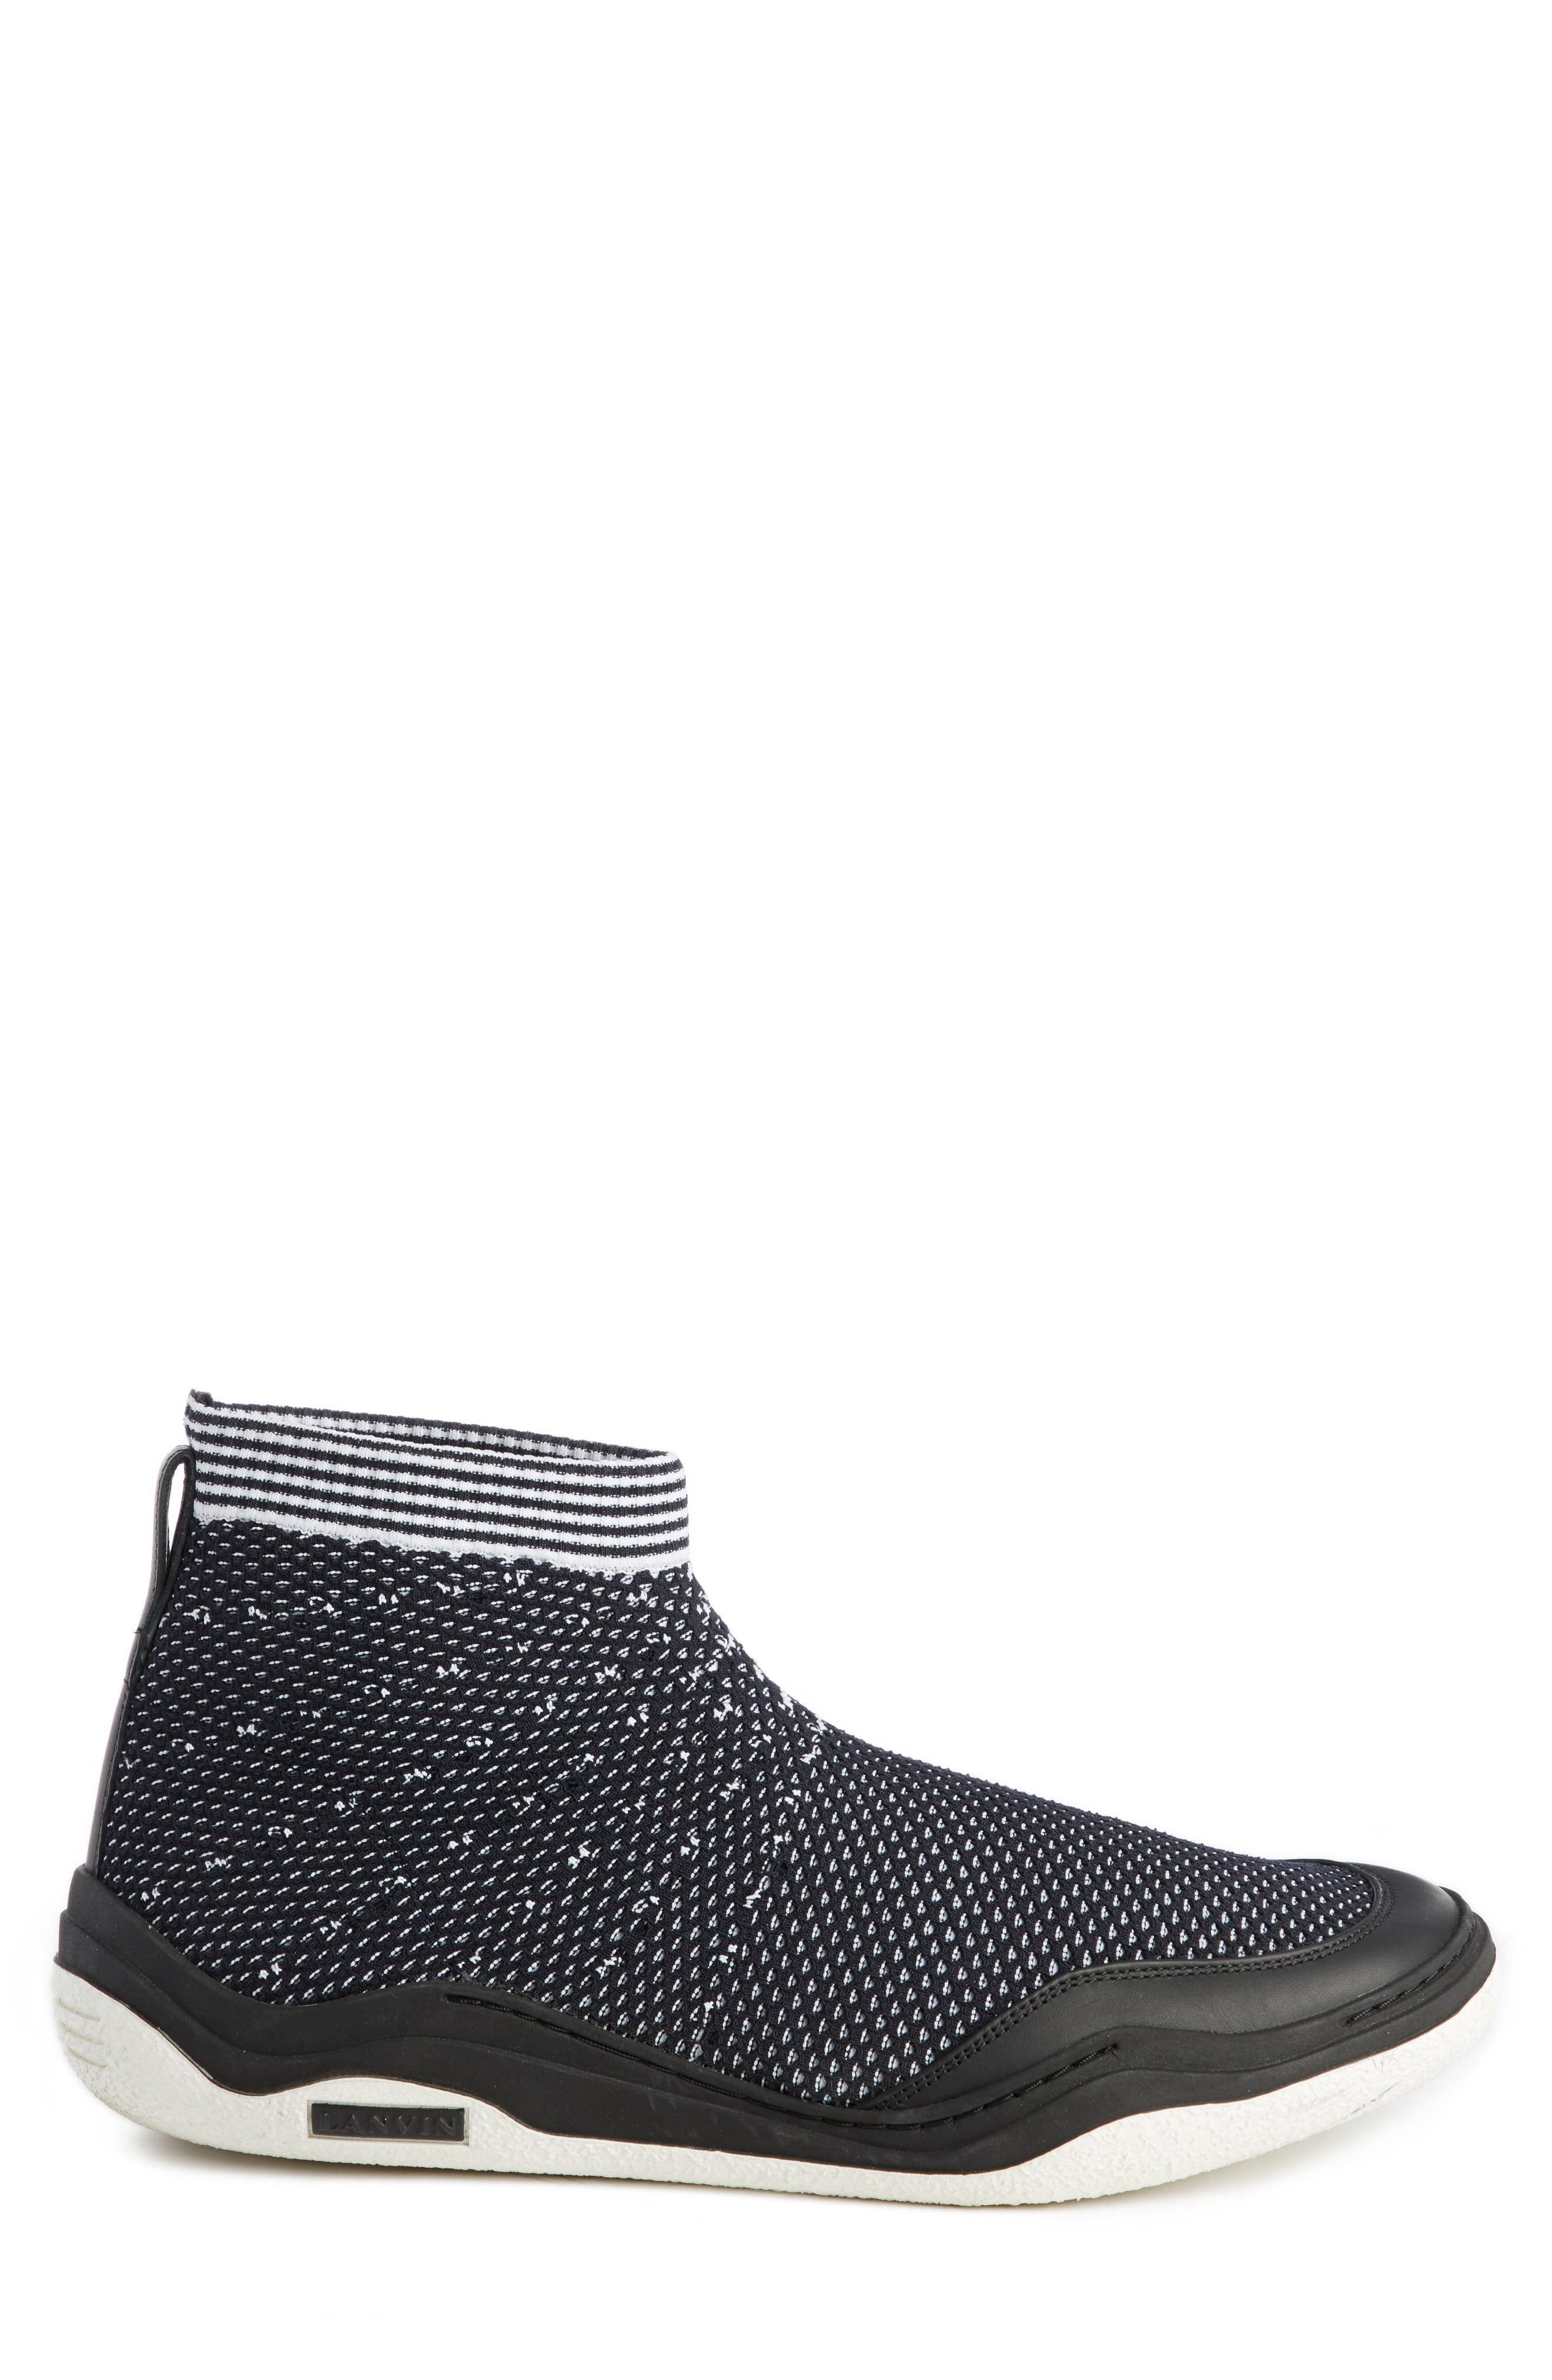 Alternate Image 4  - Lanvin Knit Sneaker (Men)